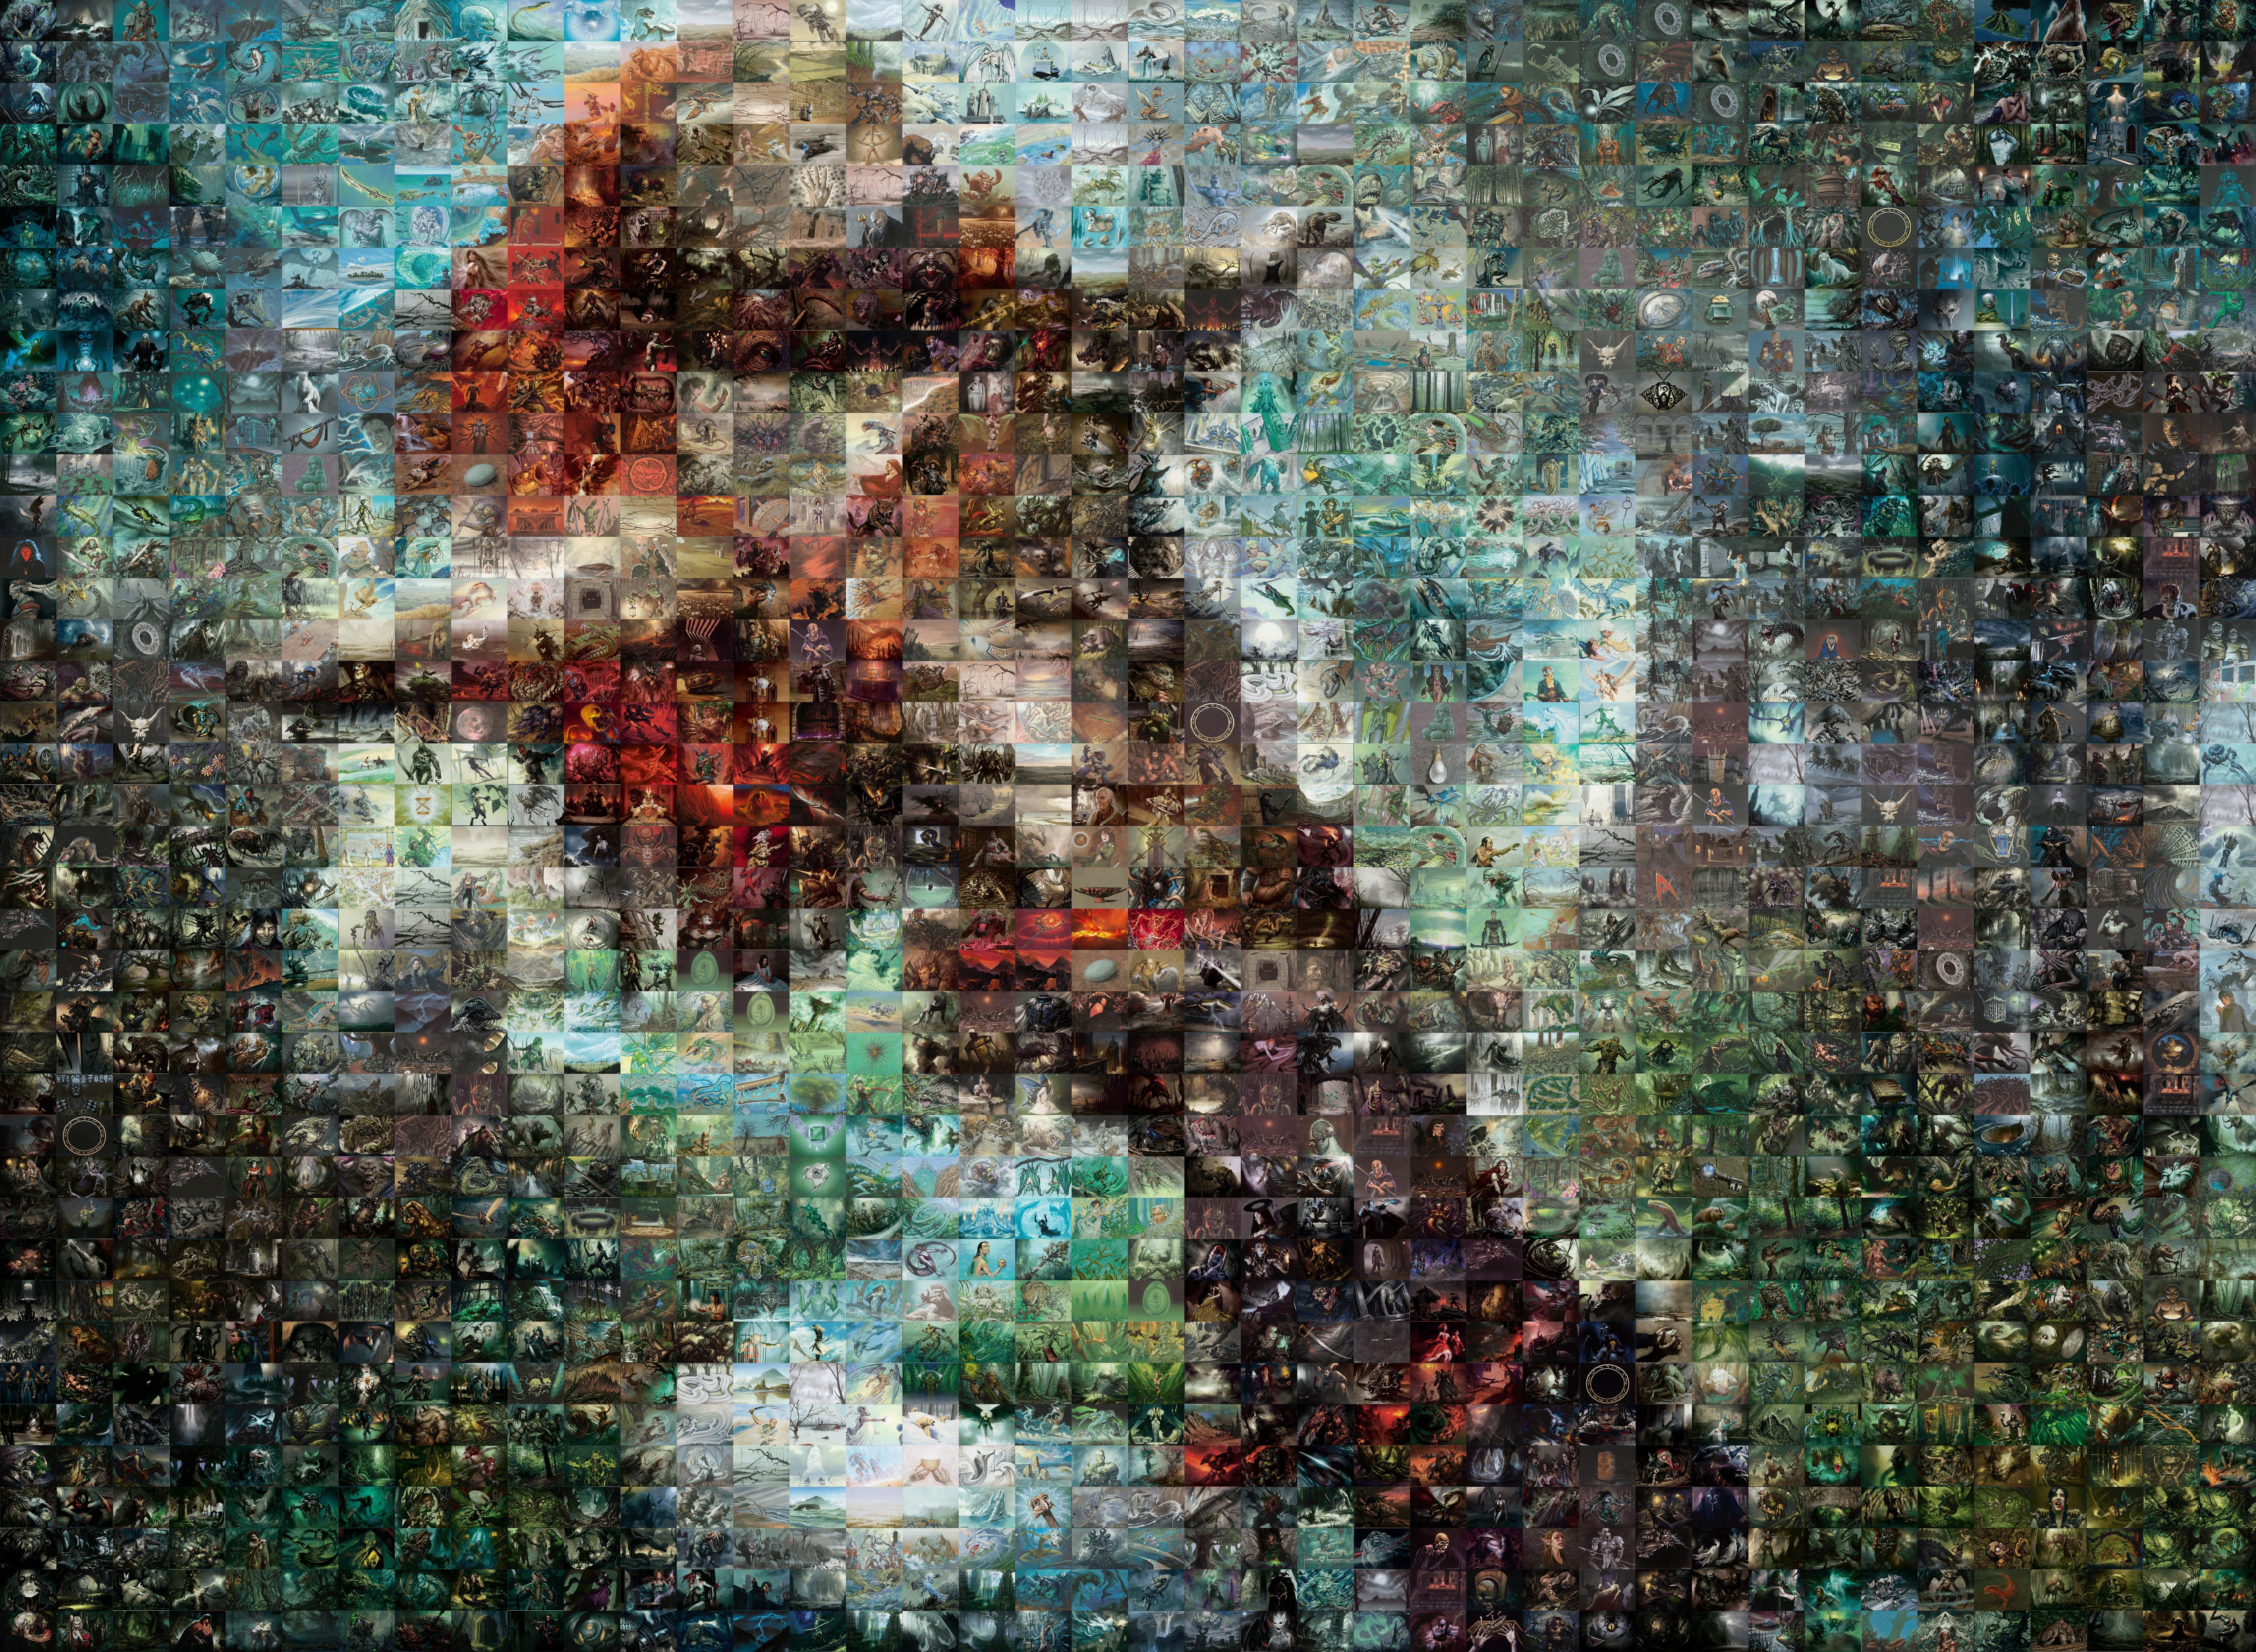 gruul-keyrune-mosaic